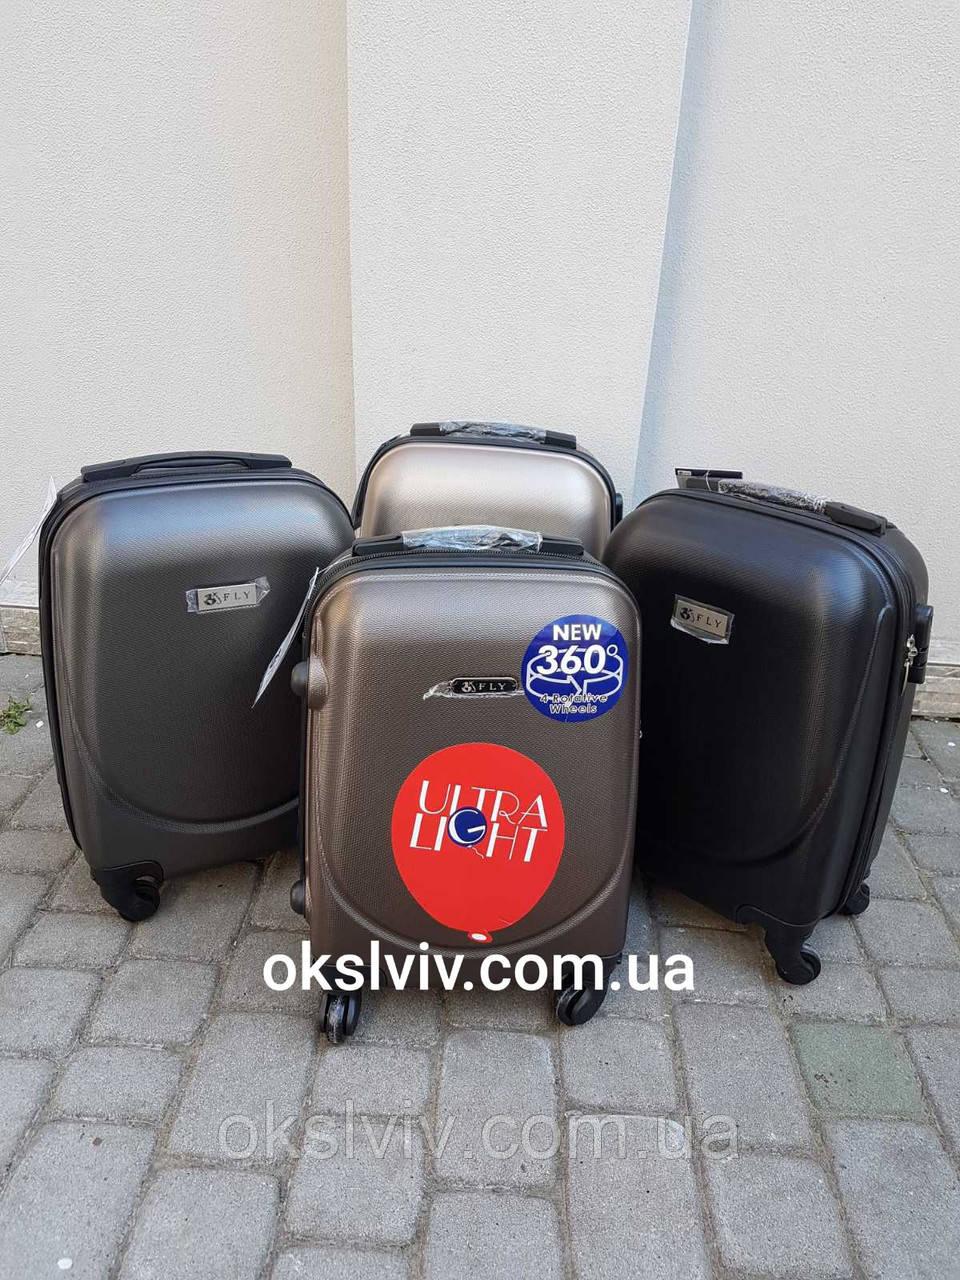 РОЗПРОДАЖ FLY K 310 Польща ручна поклажа валізи чемоданы сумки на колесах